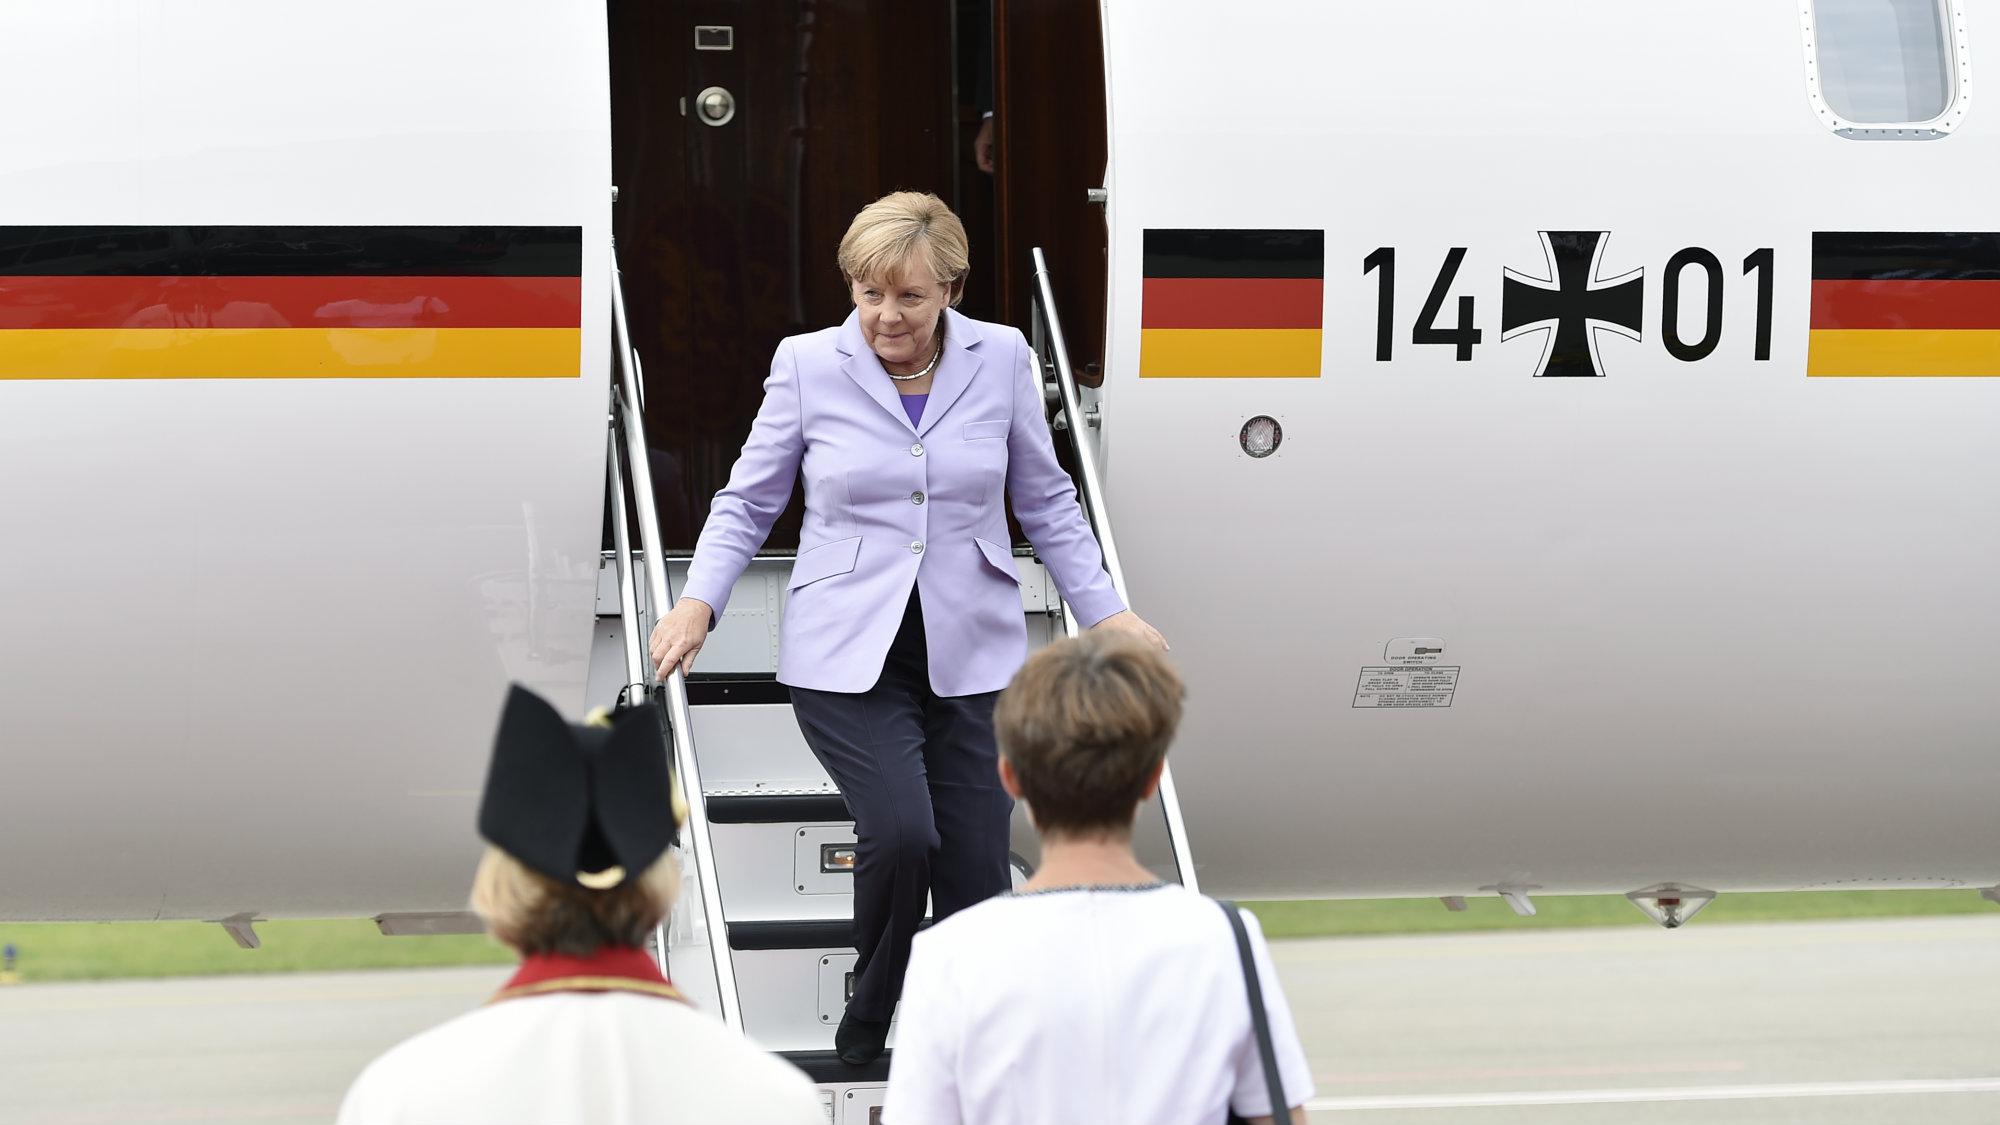 German Chancellor Angela Merkel disembarks a plane.